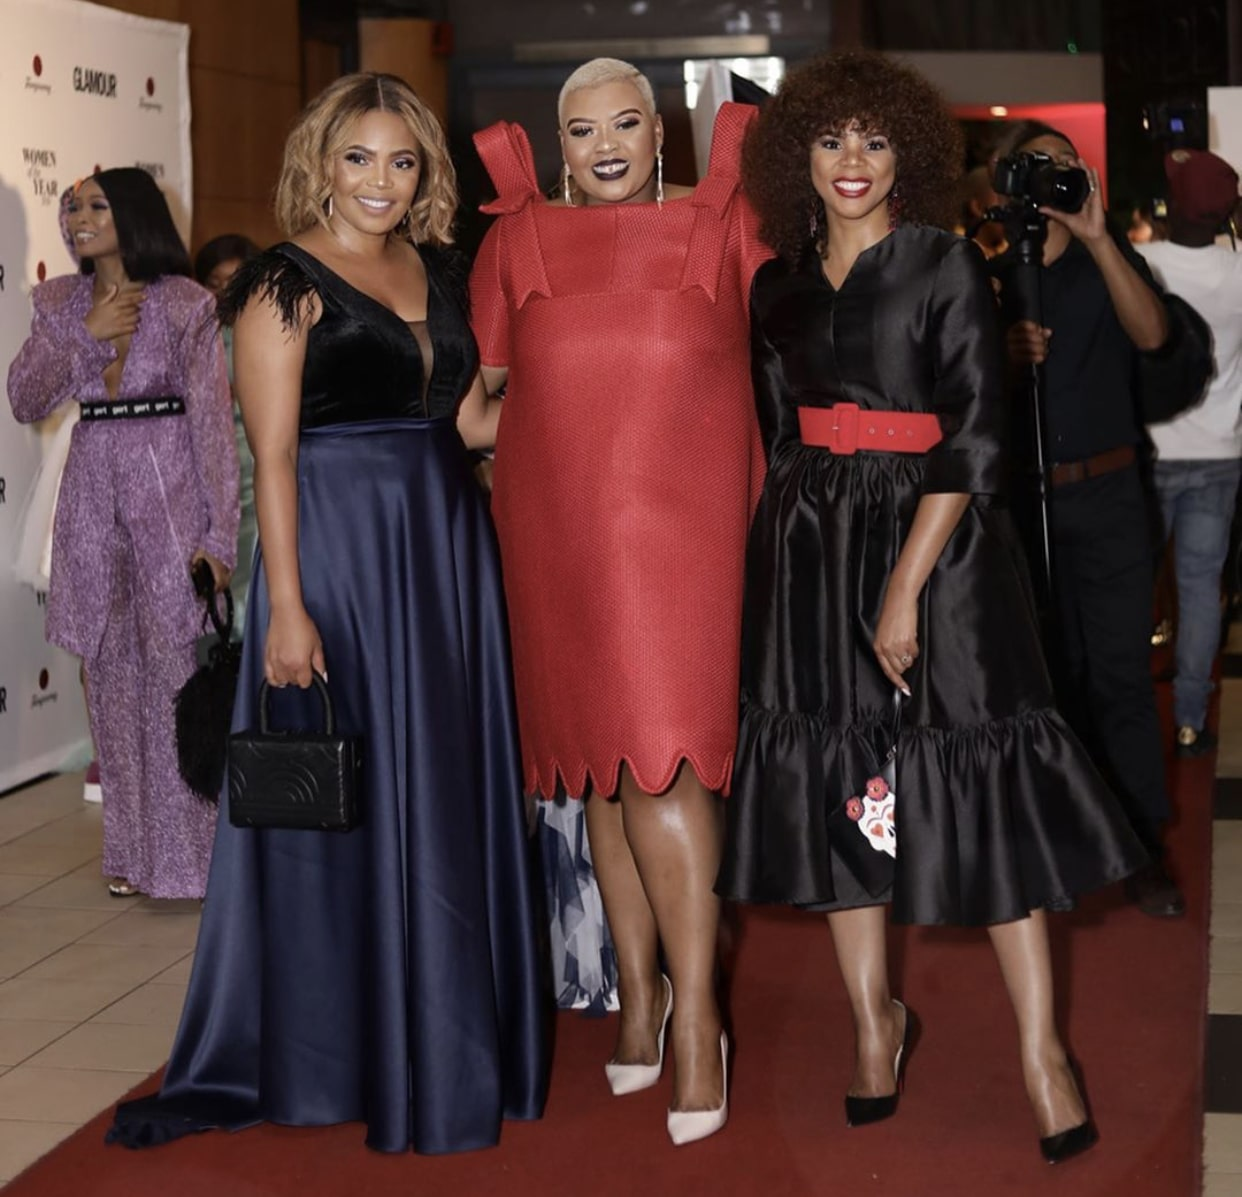 anele-mdoda-glamour-women-sa-2019